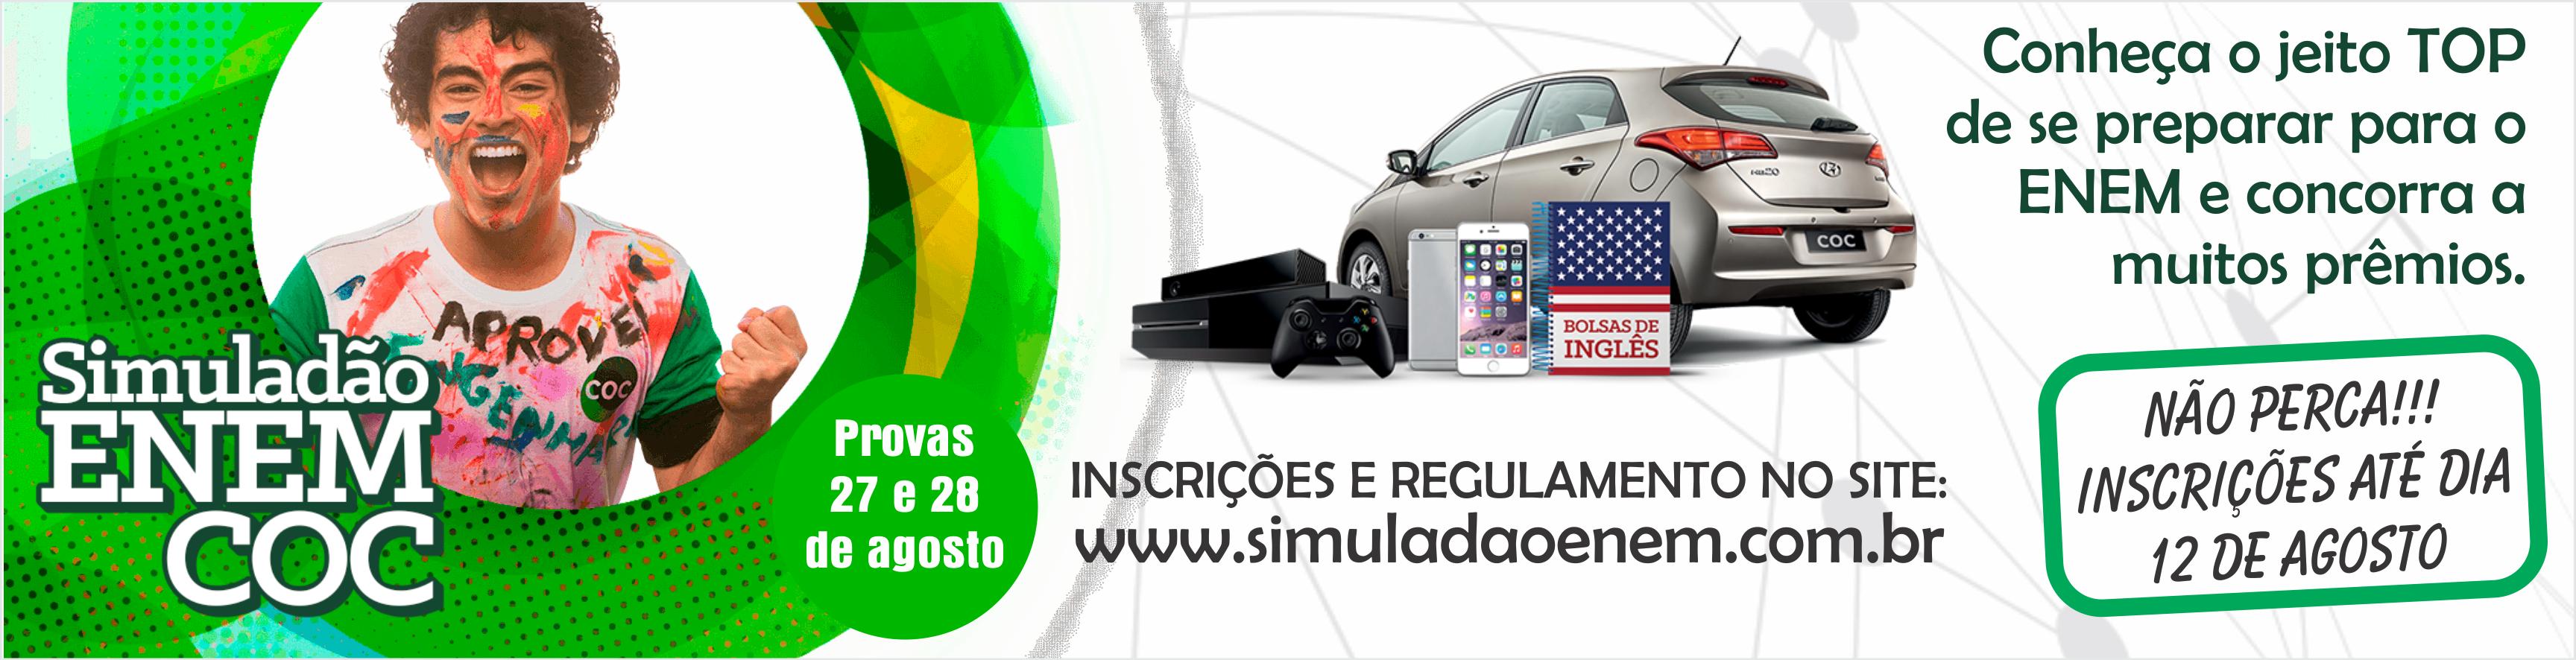 Banner-simuladao-COC-2016